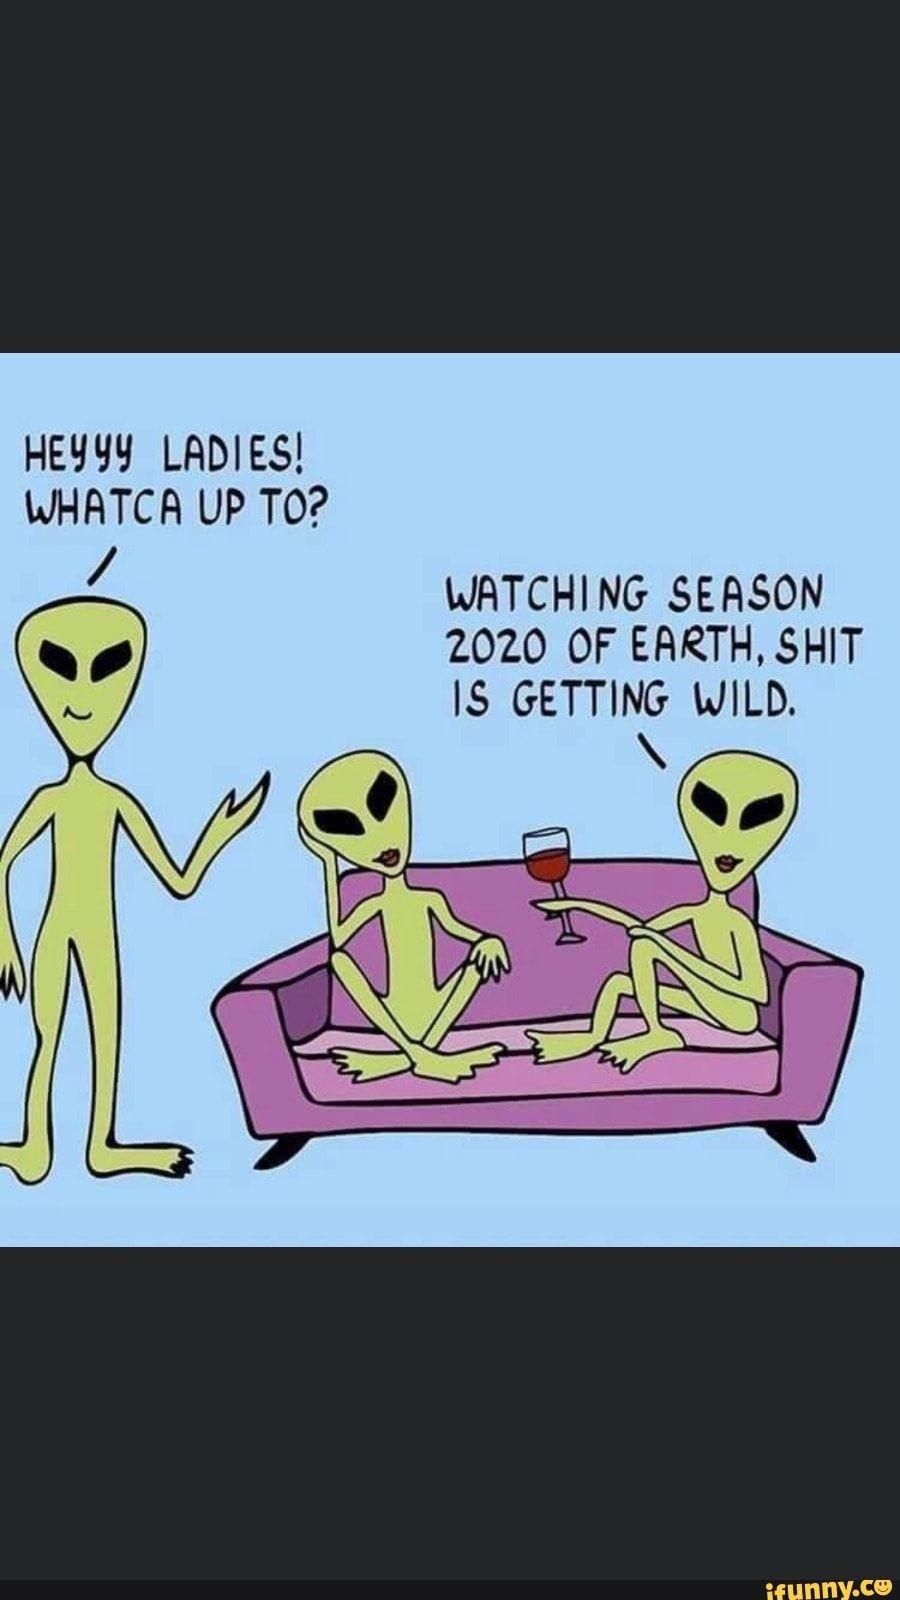 PG Mean rg 4 WATCHING SEASON 2020 OF EARTH, SHIT IS GETTING WILD. - )